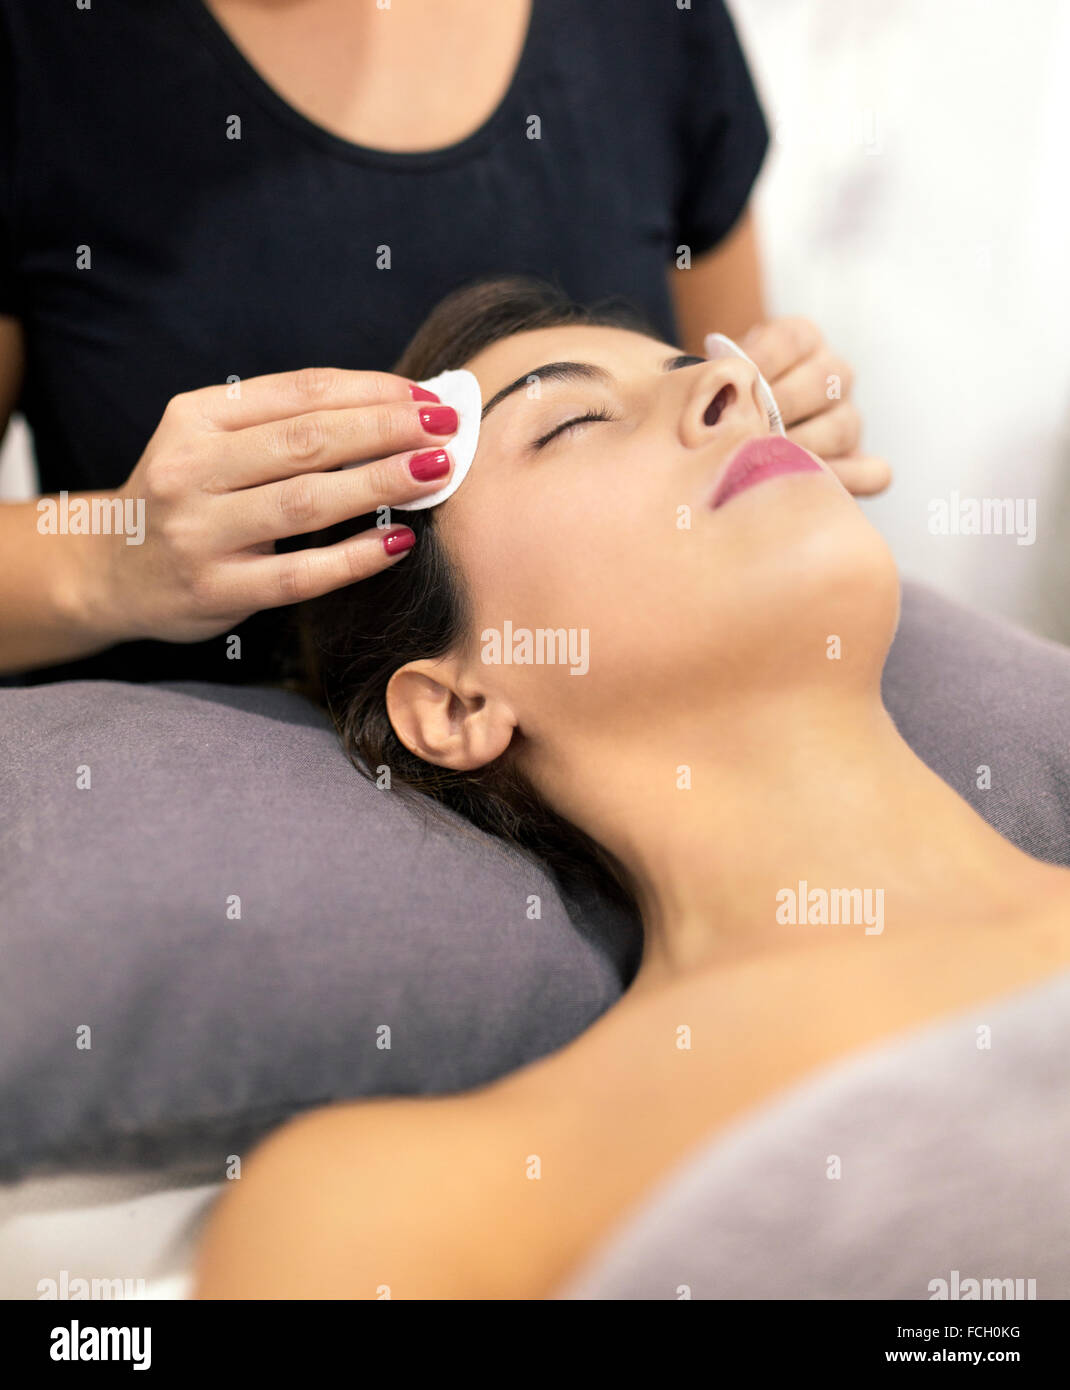 Junge Frau erhält eine Beauty-Behandlung Stockbild